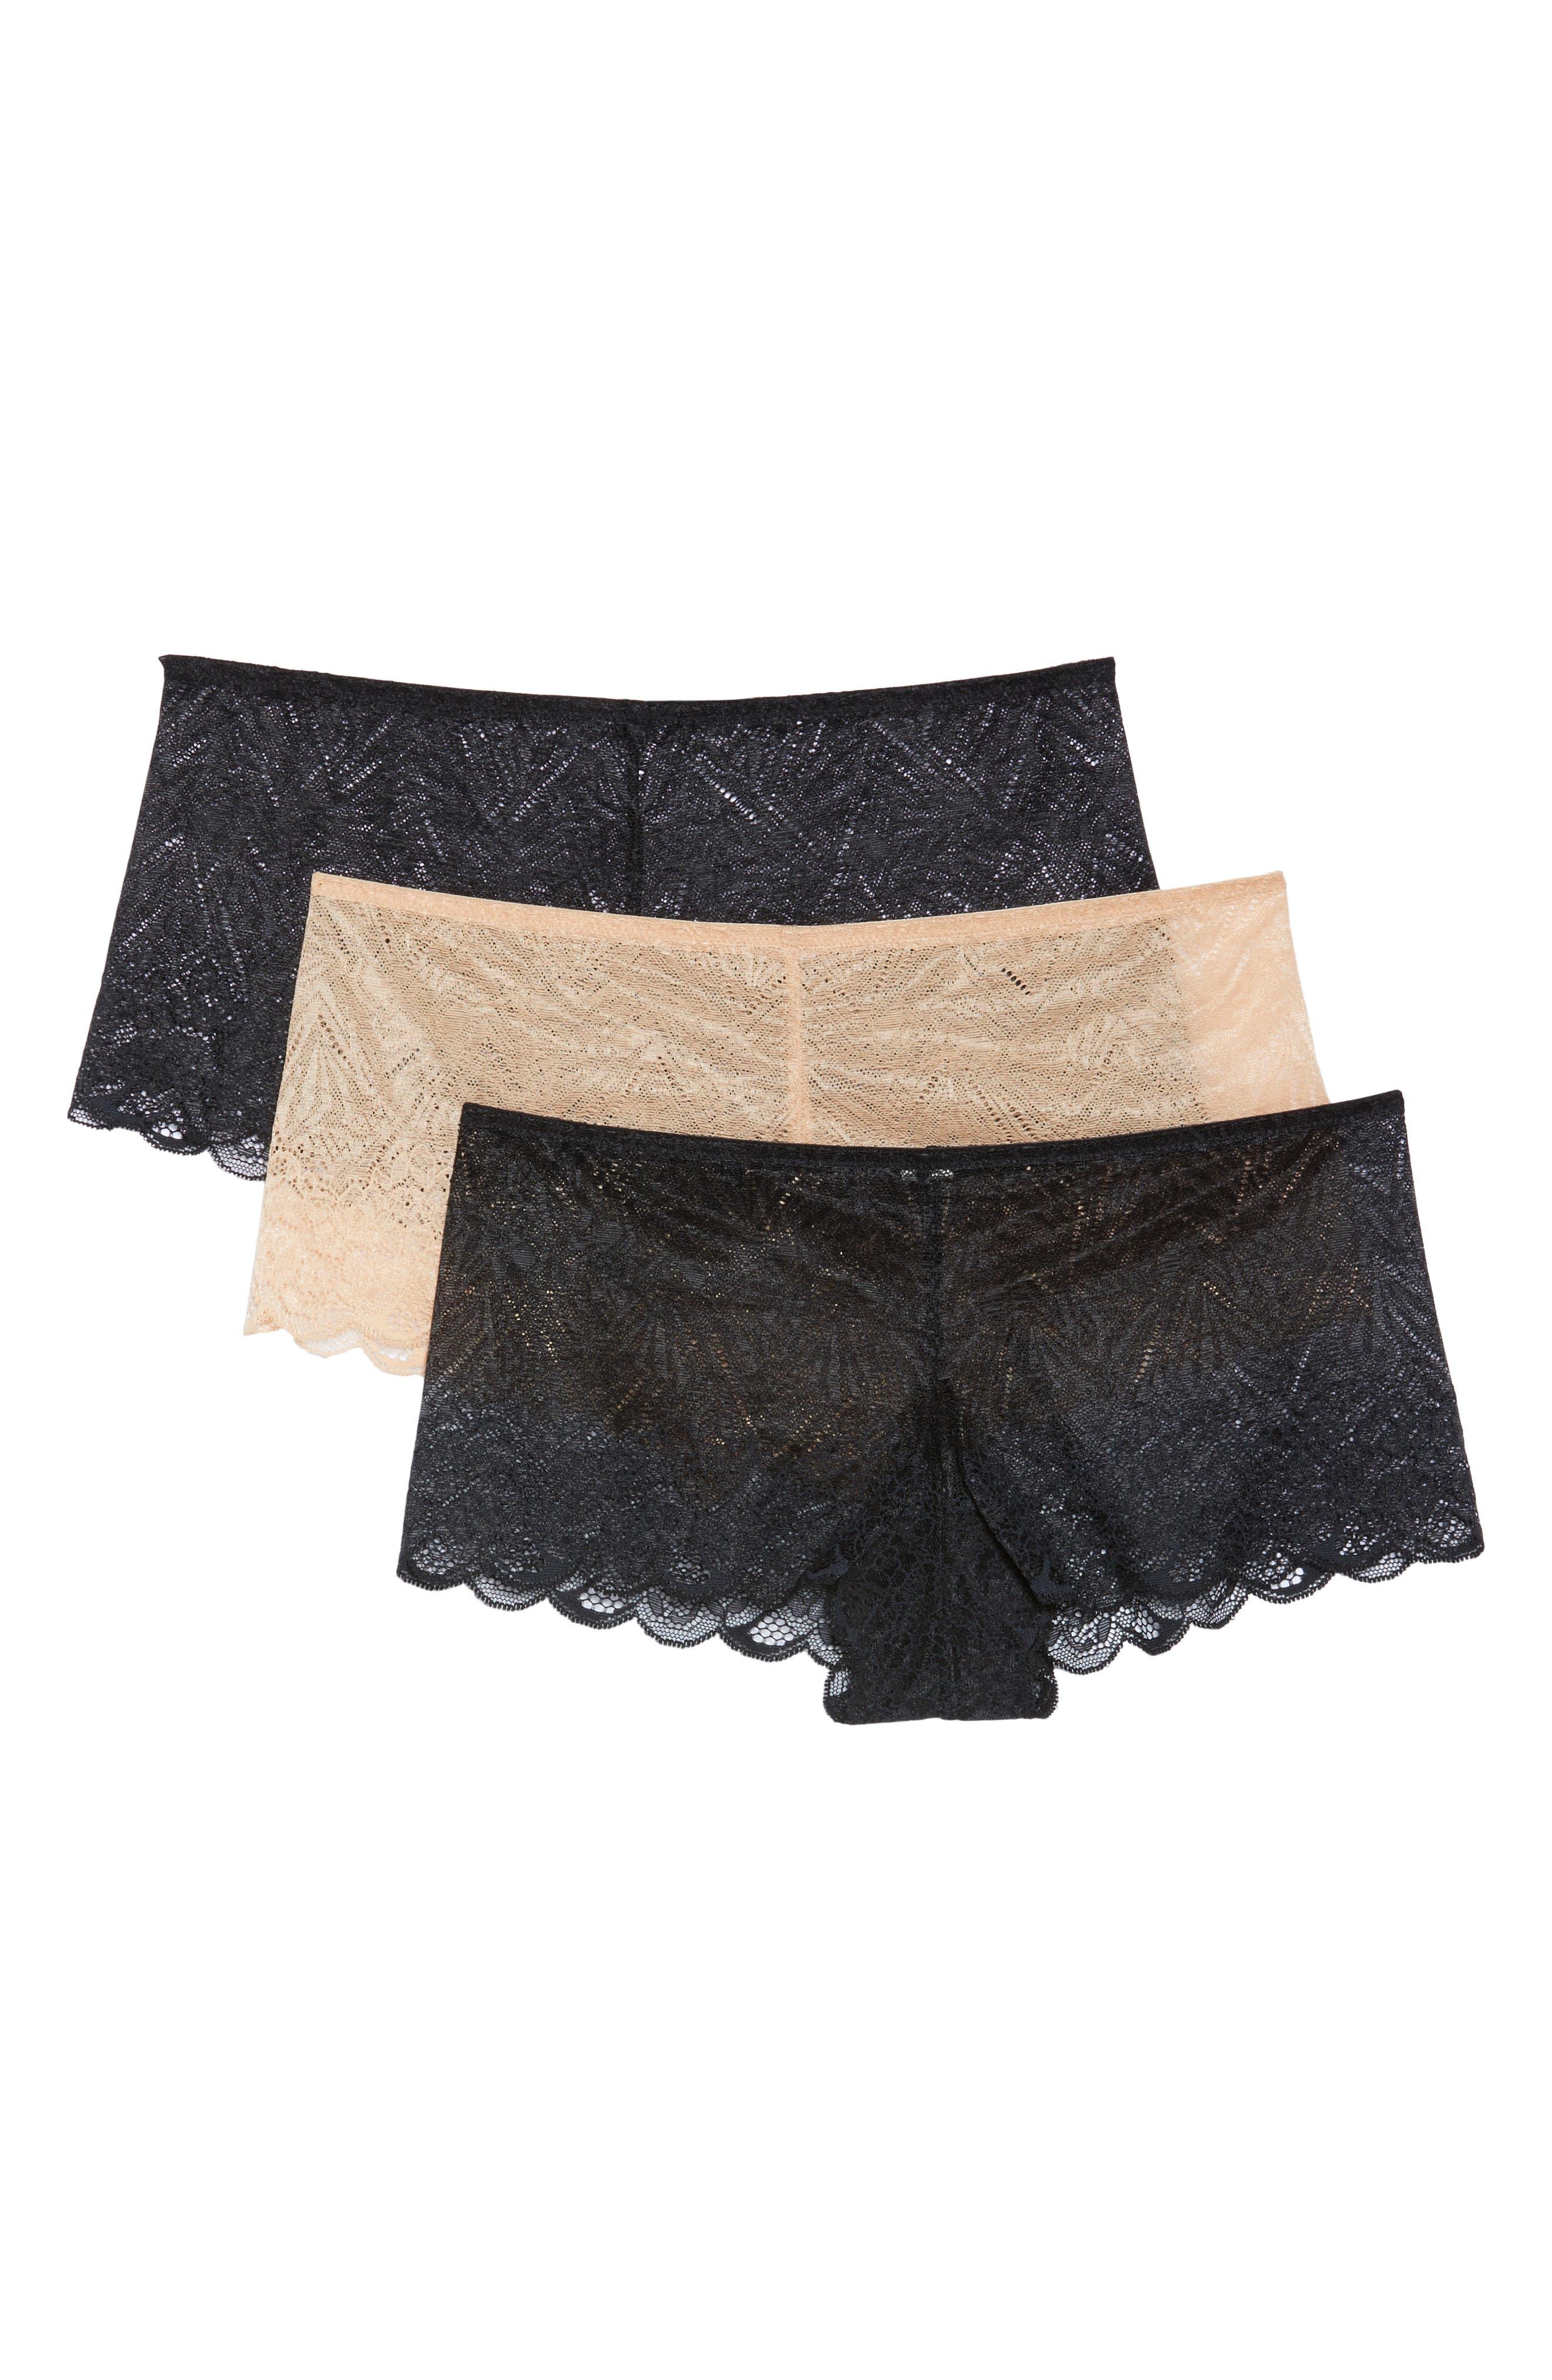 3-Pack Lace Boyshorts,                             Main thumbnail 1, color,                             Black/ Black/ Beige